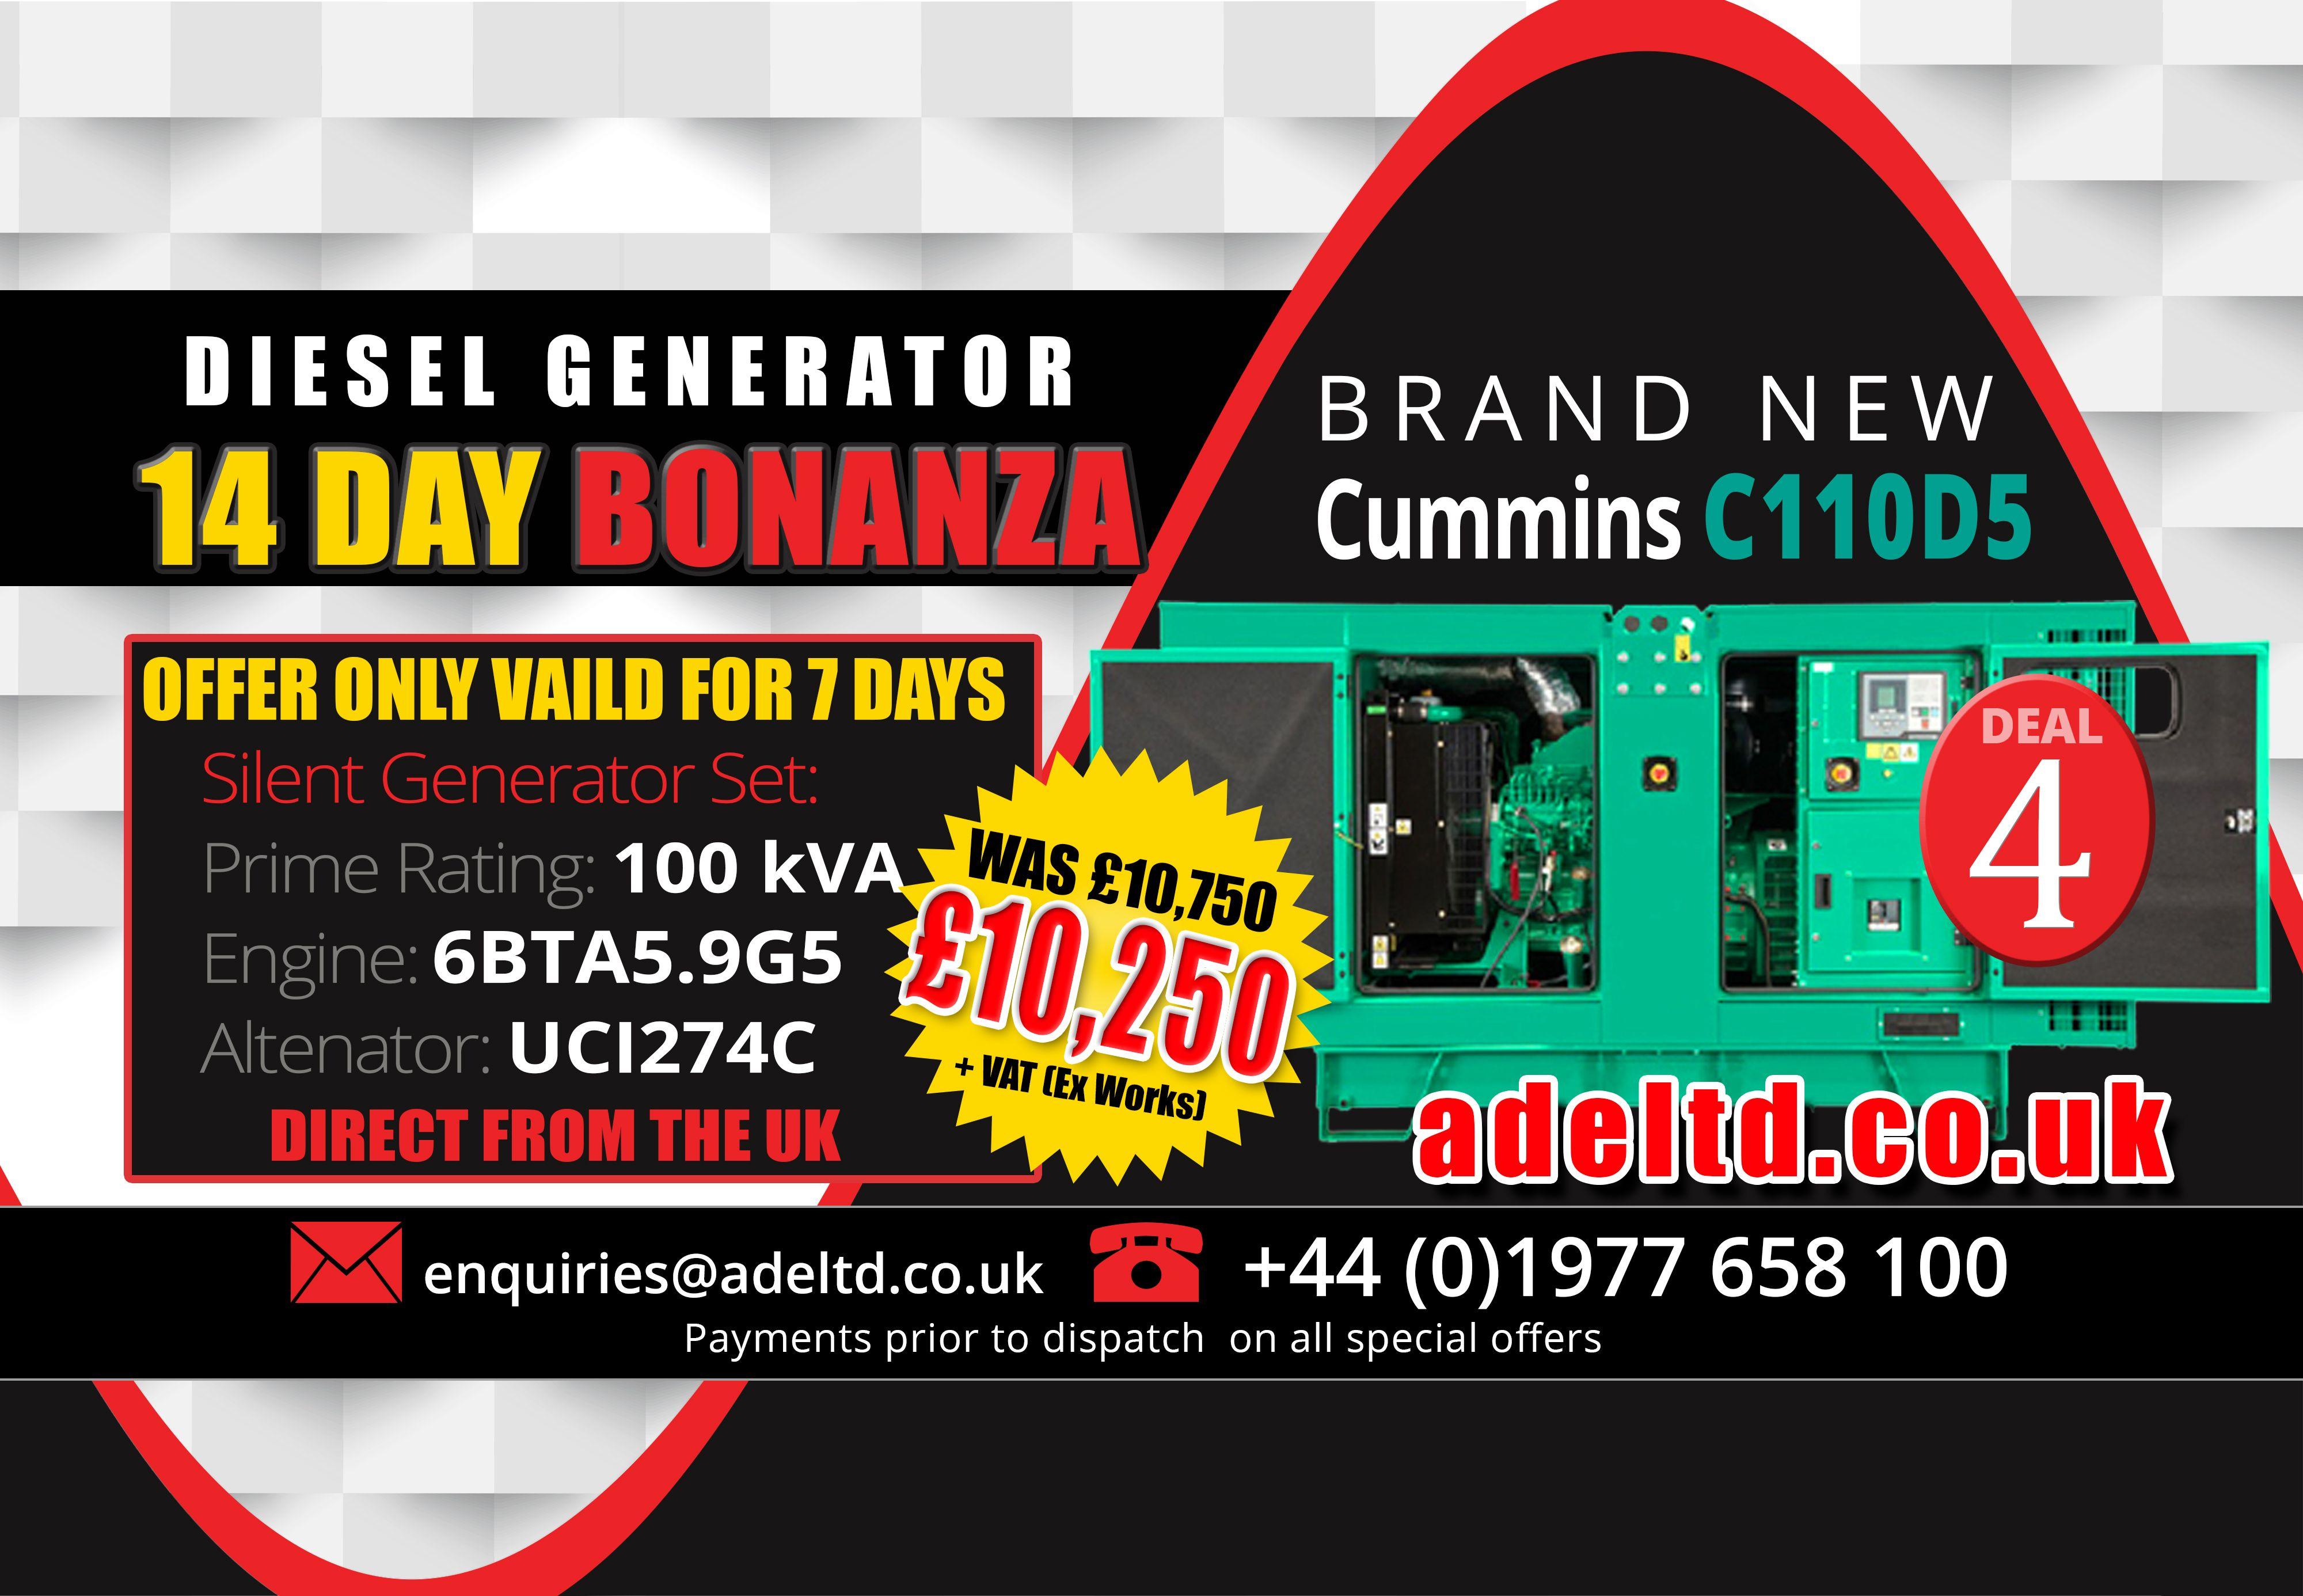 It s day 4 of the Advanced 14 Day DieselGenerator Bonanza at